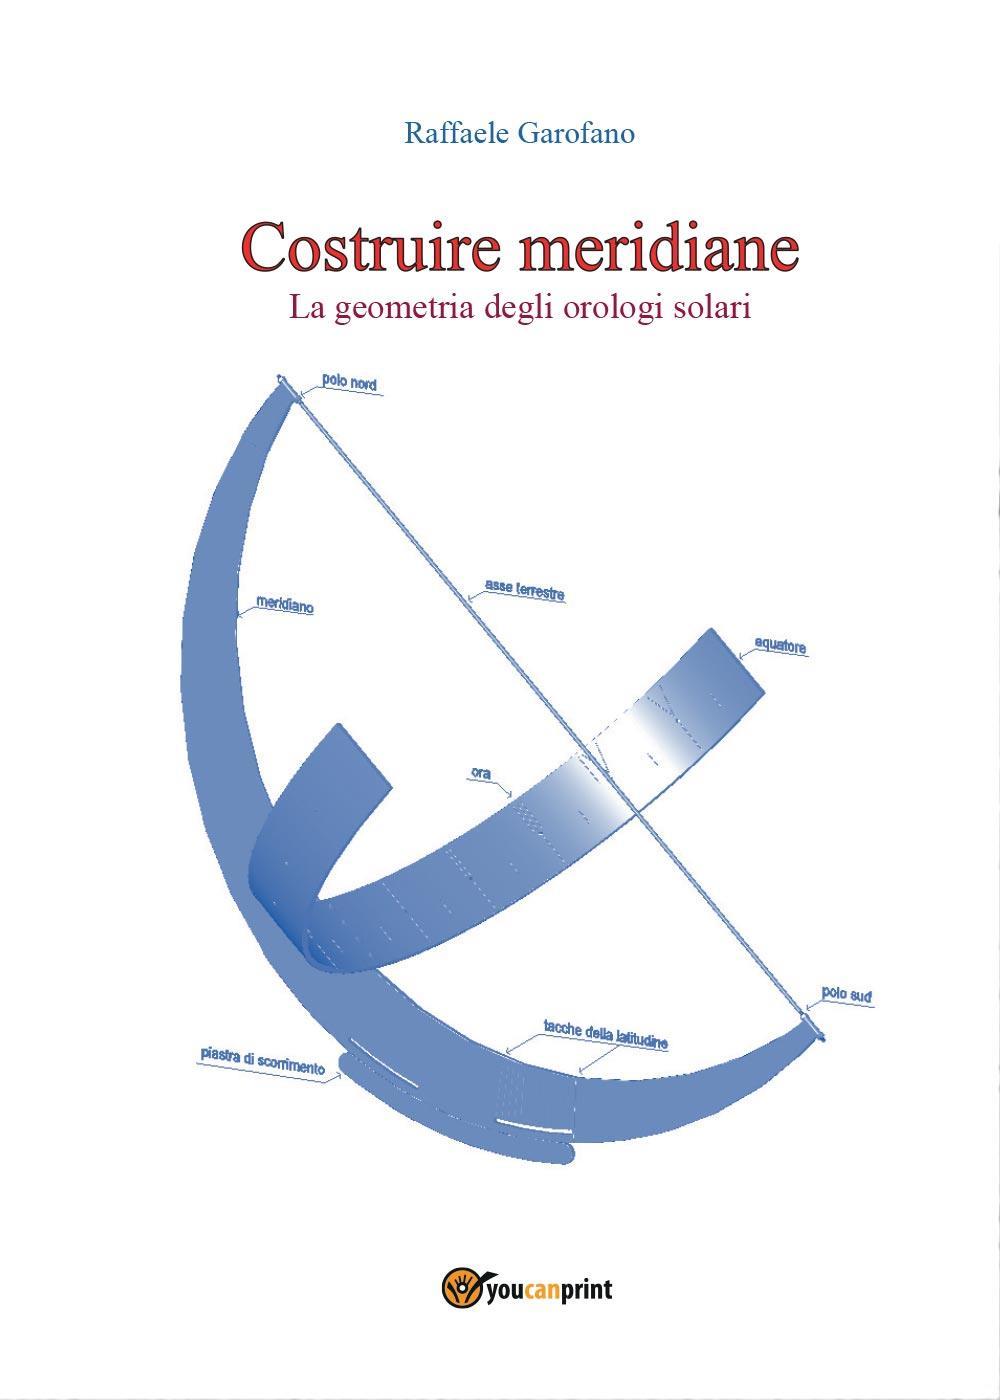 Costruire meridiane - la geometria degli orologi solari